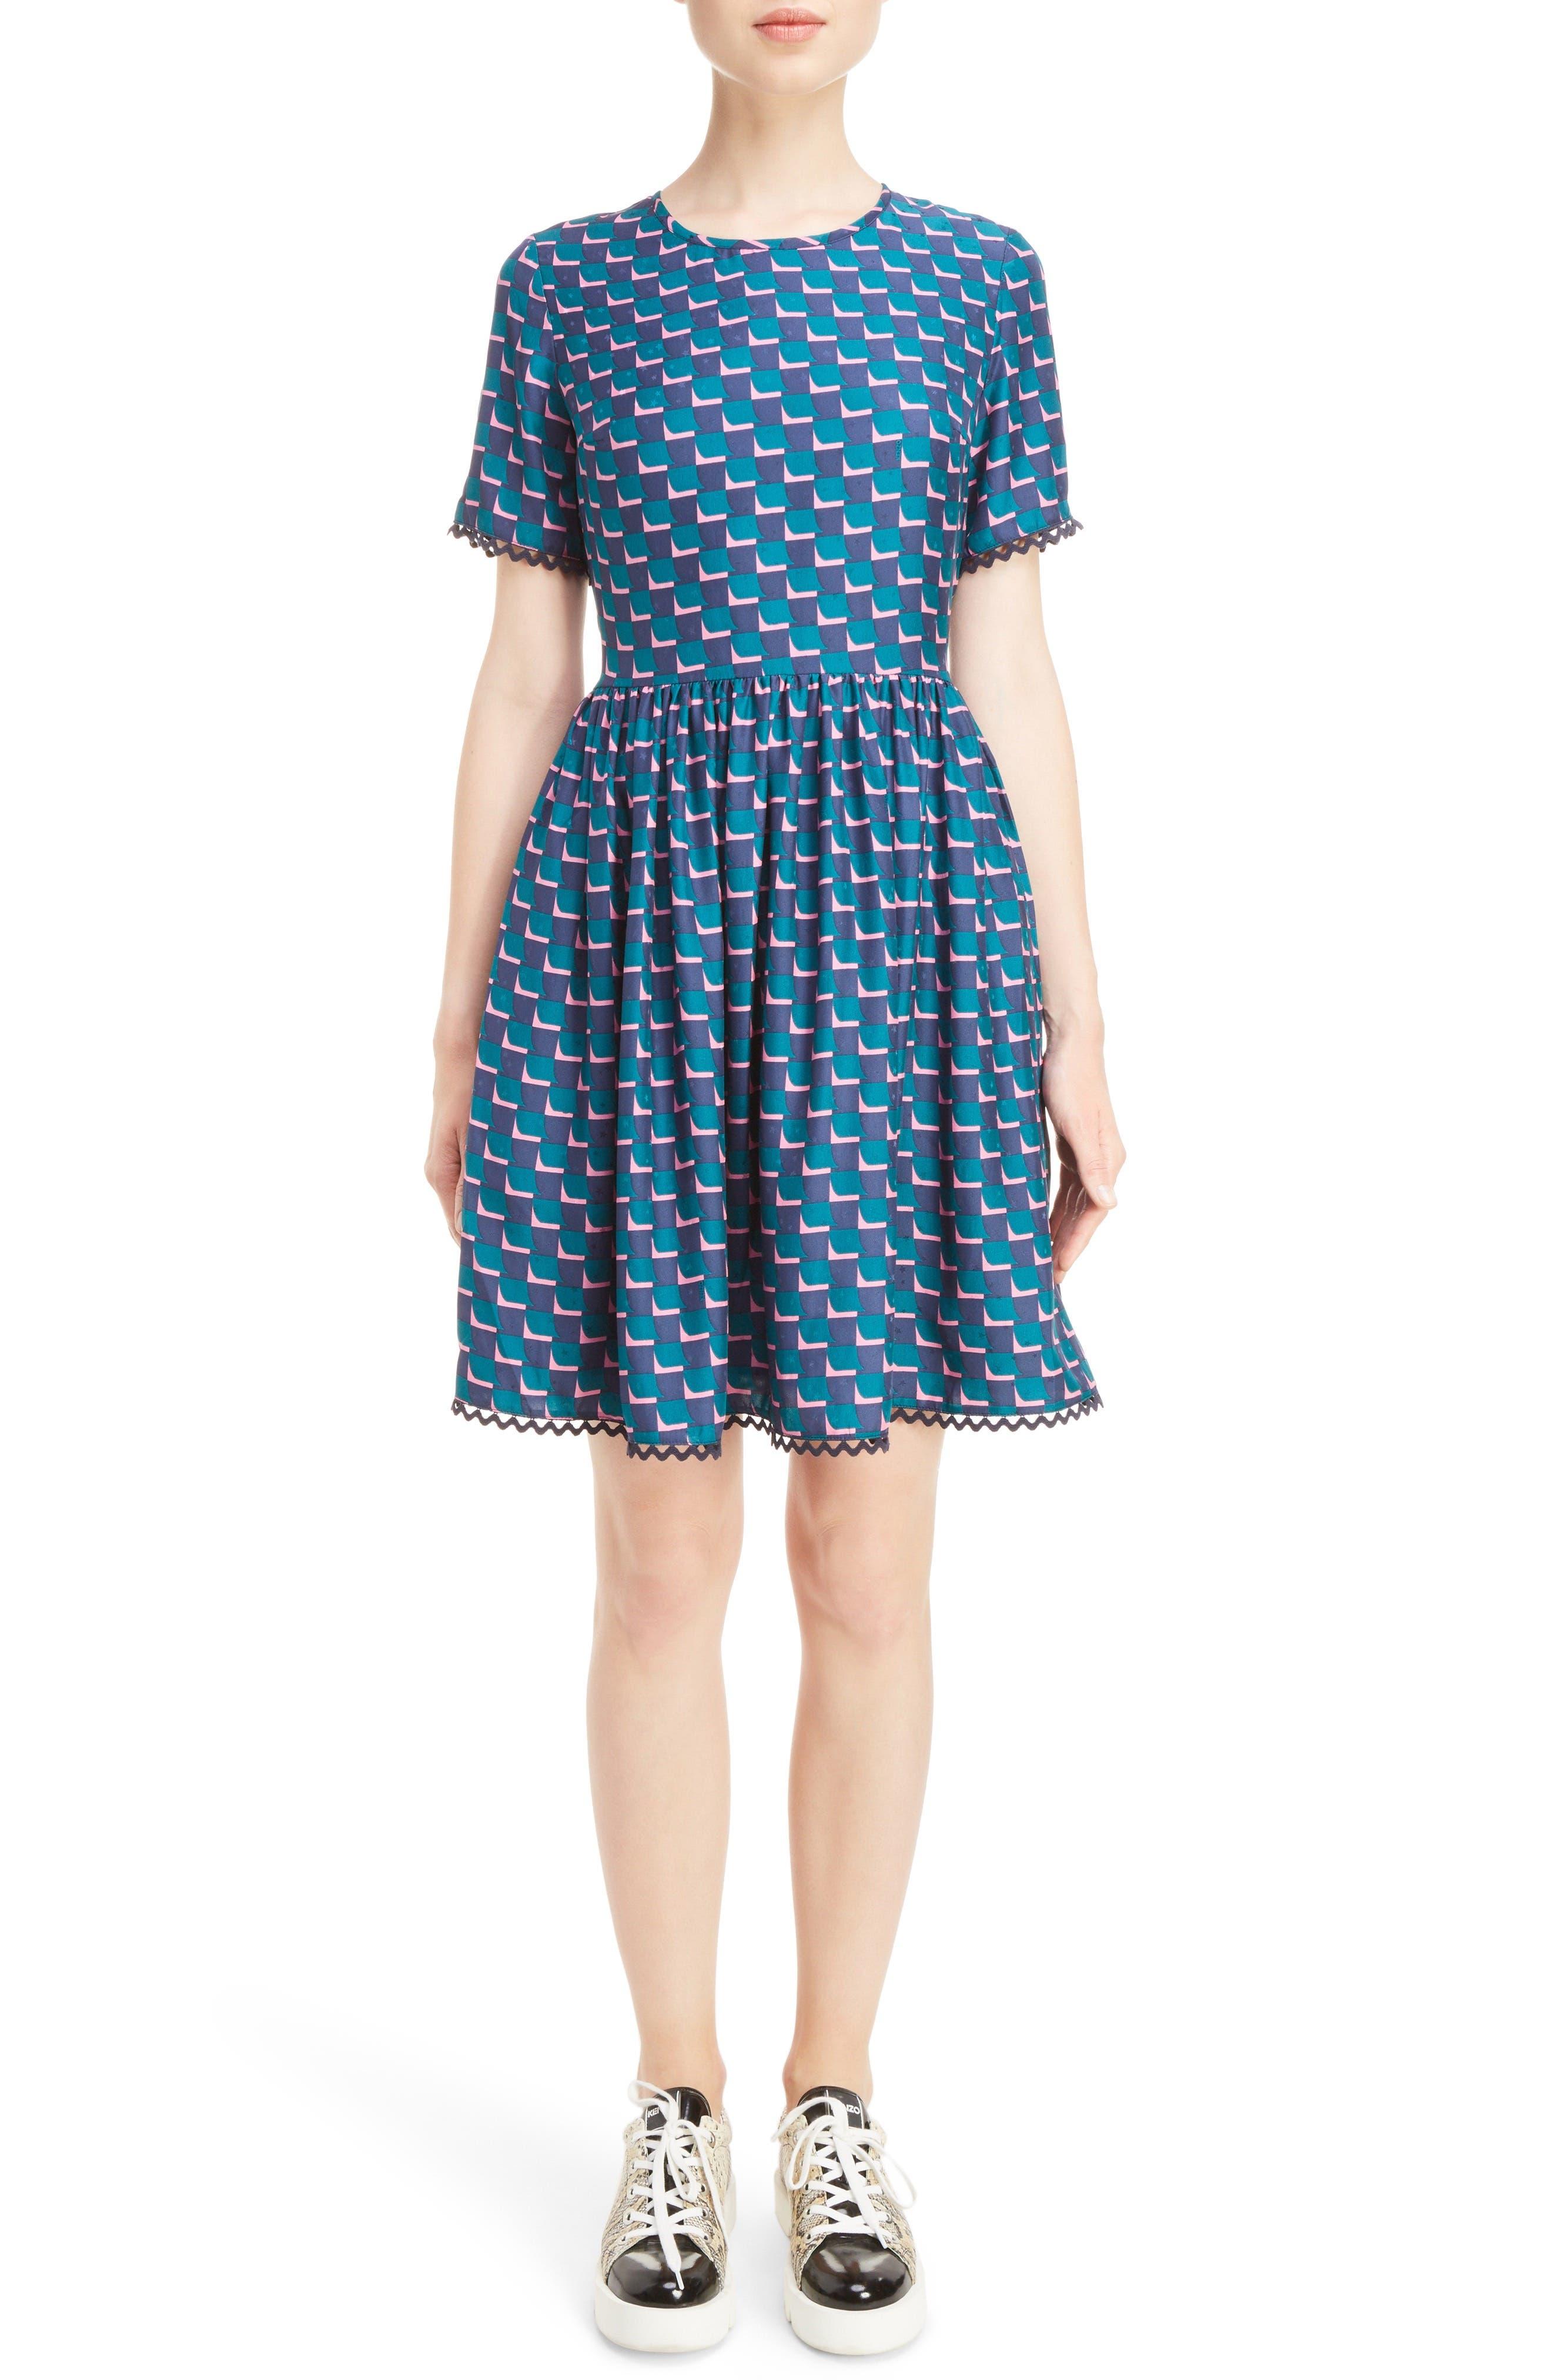 KENZO Silk Jacquard Dress